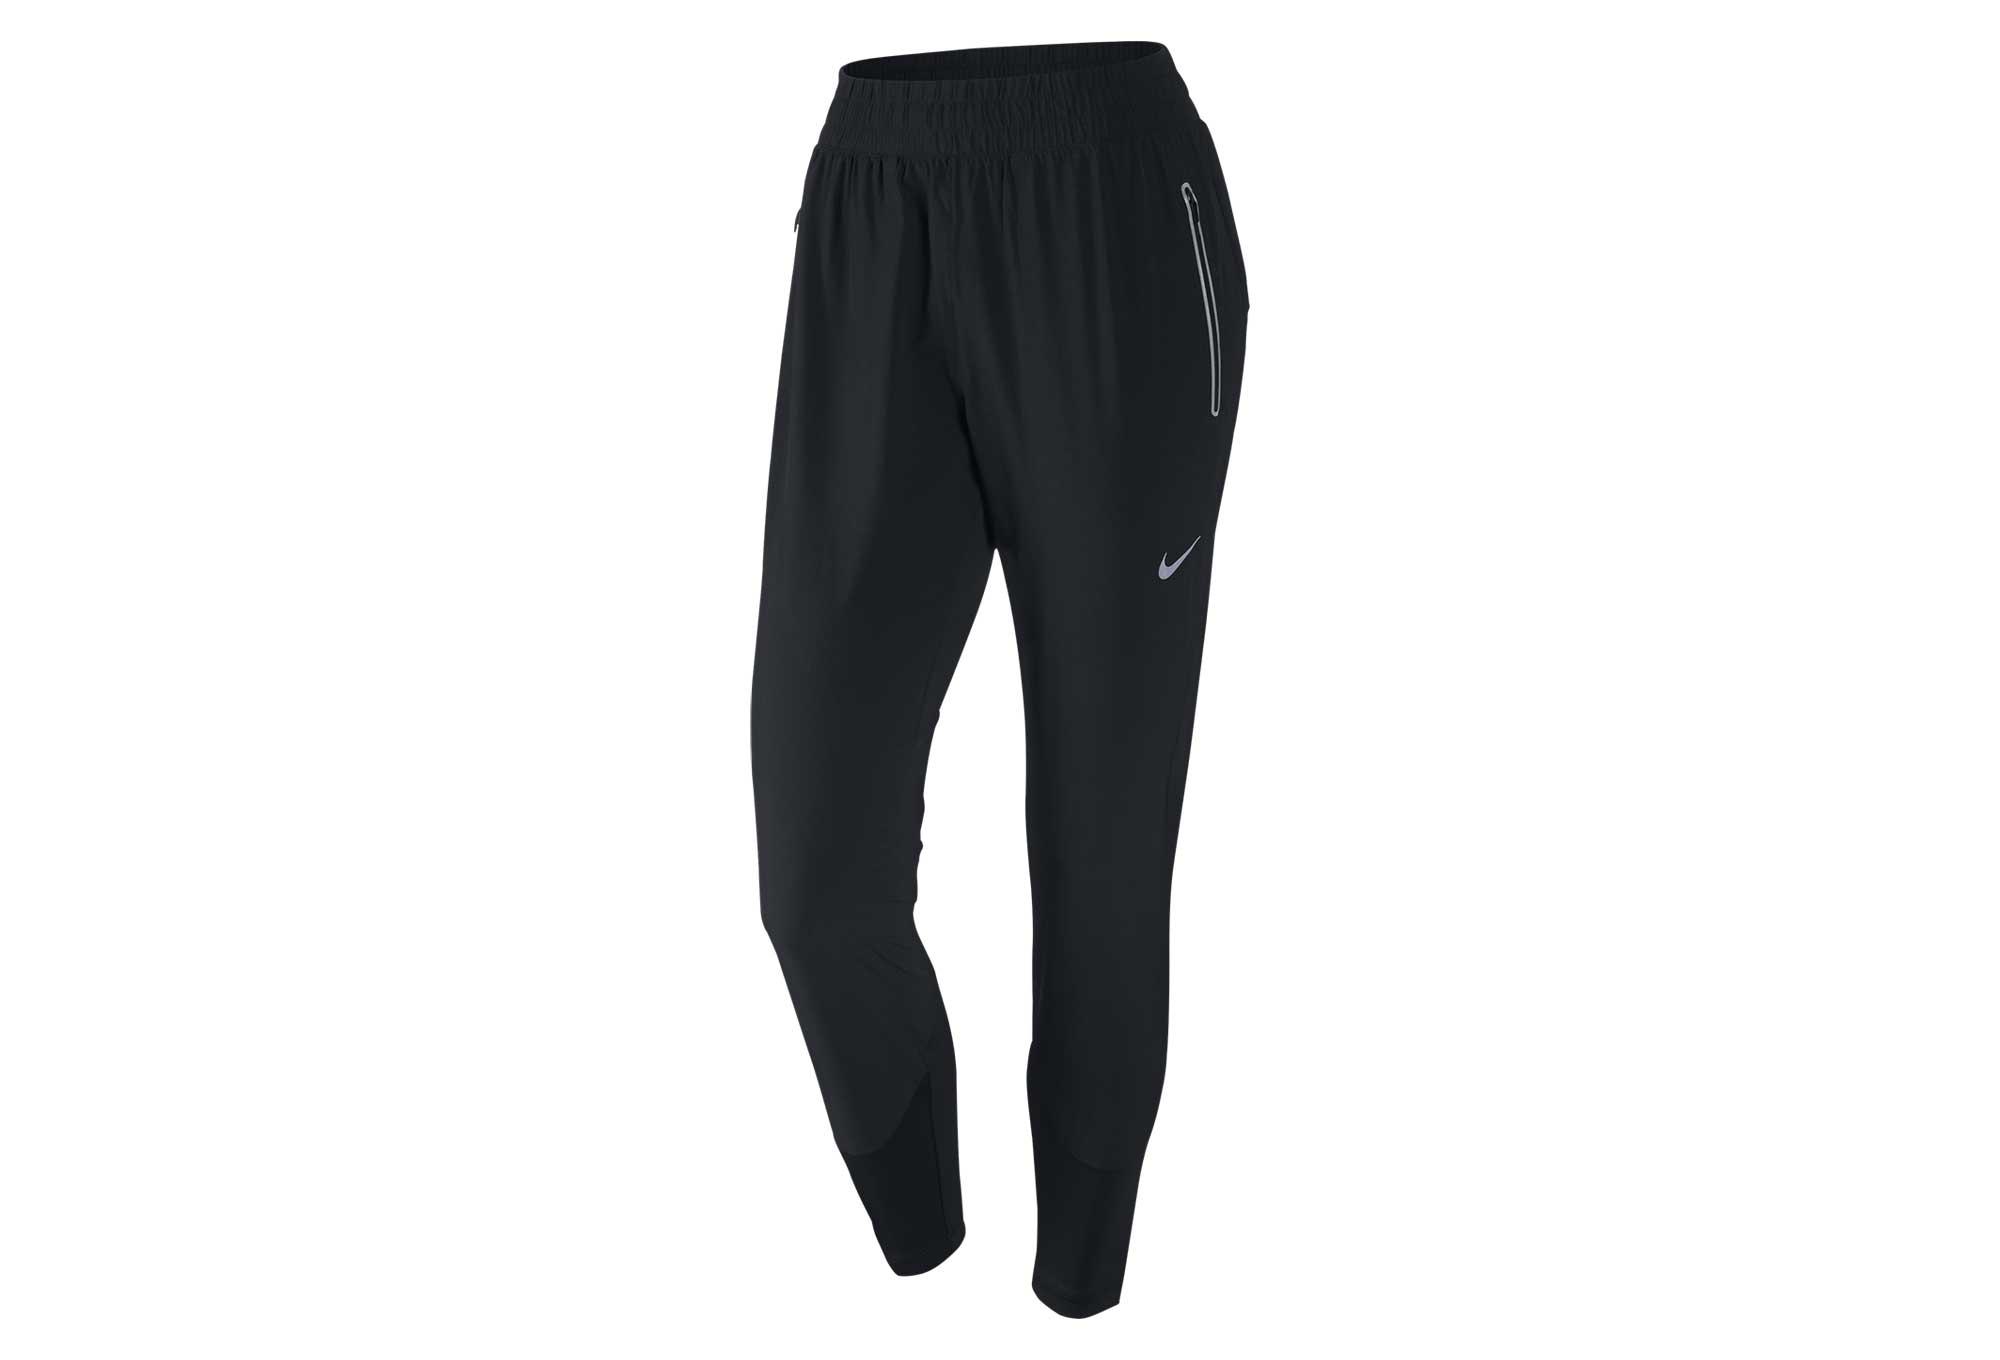 8a05248204fb Nike Flex Swift Women Sport Pants Black